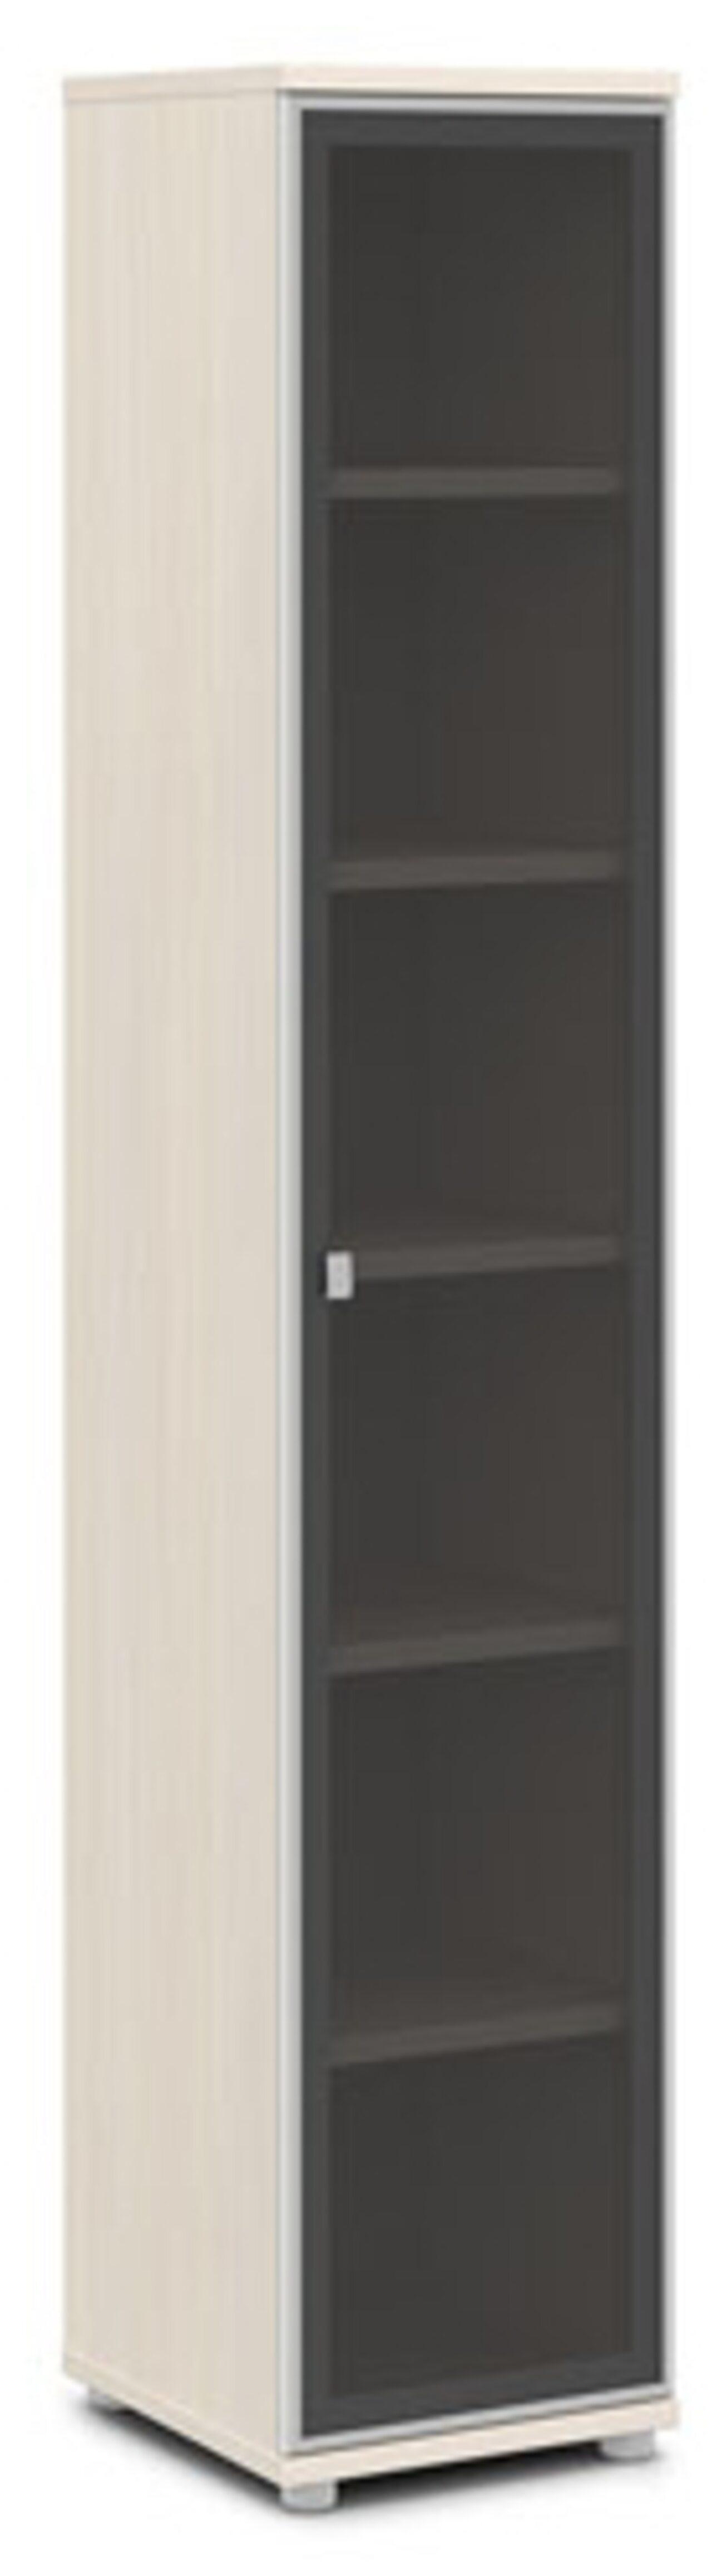 Шкаф со стеклом в алюминиевом профиле  Vasanta 42x44x220 - фото 6